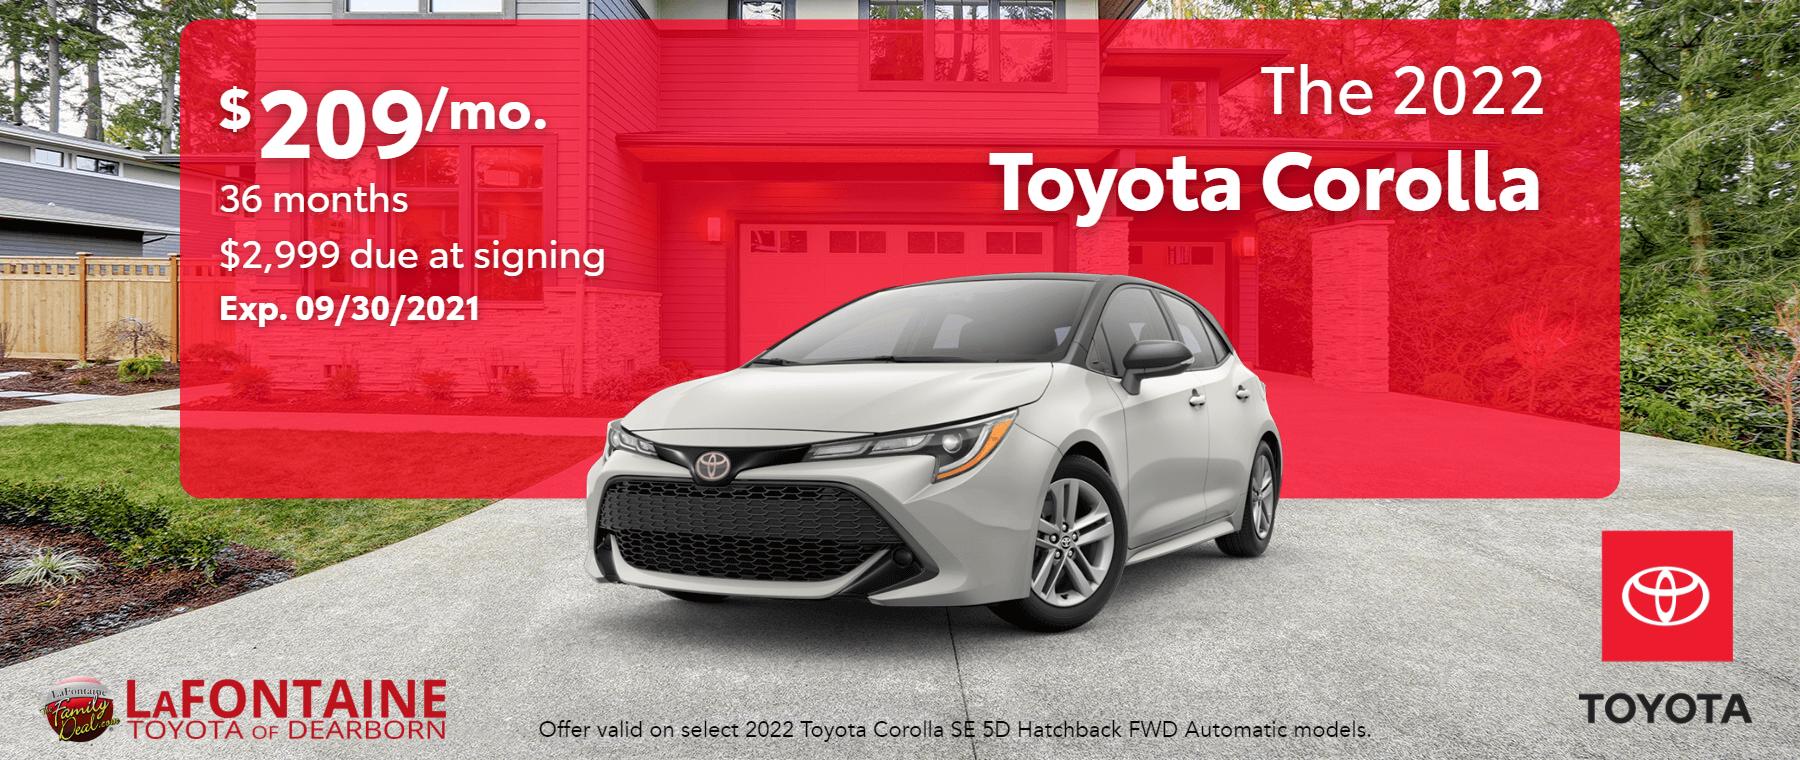 2022_Toyota_Corolla_SE Hatchback_Thu Sep 09 2021 11_52_39 GMT-0400 (Eastern Daylight Time)